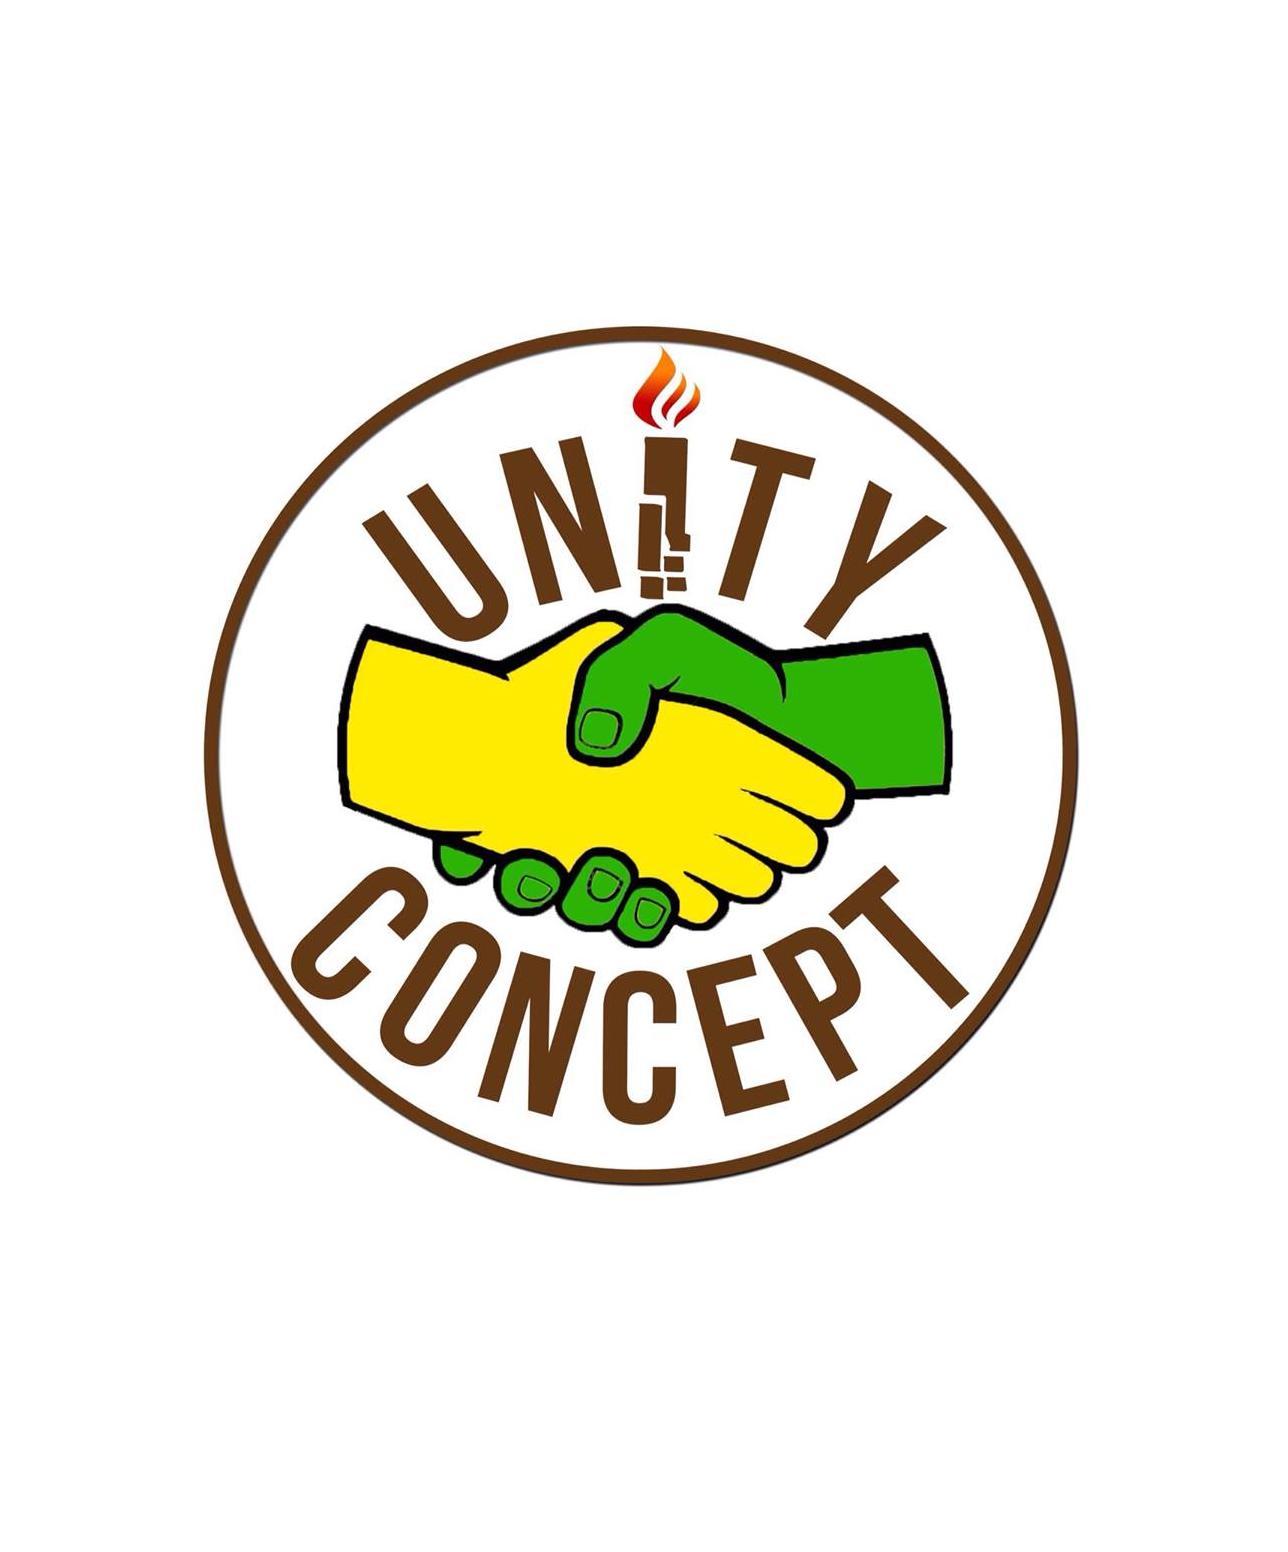 UNITY Concept